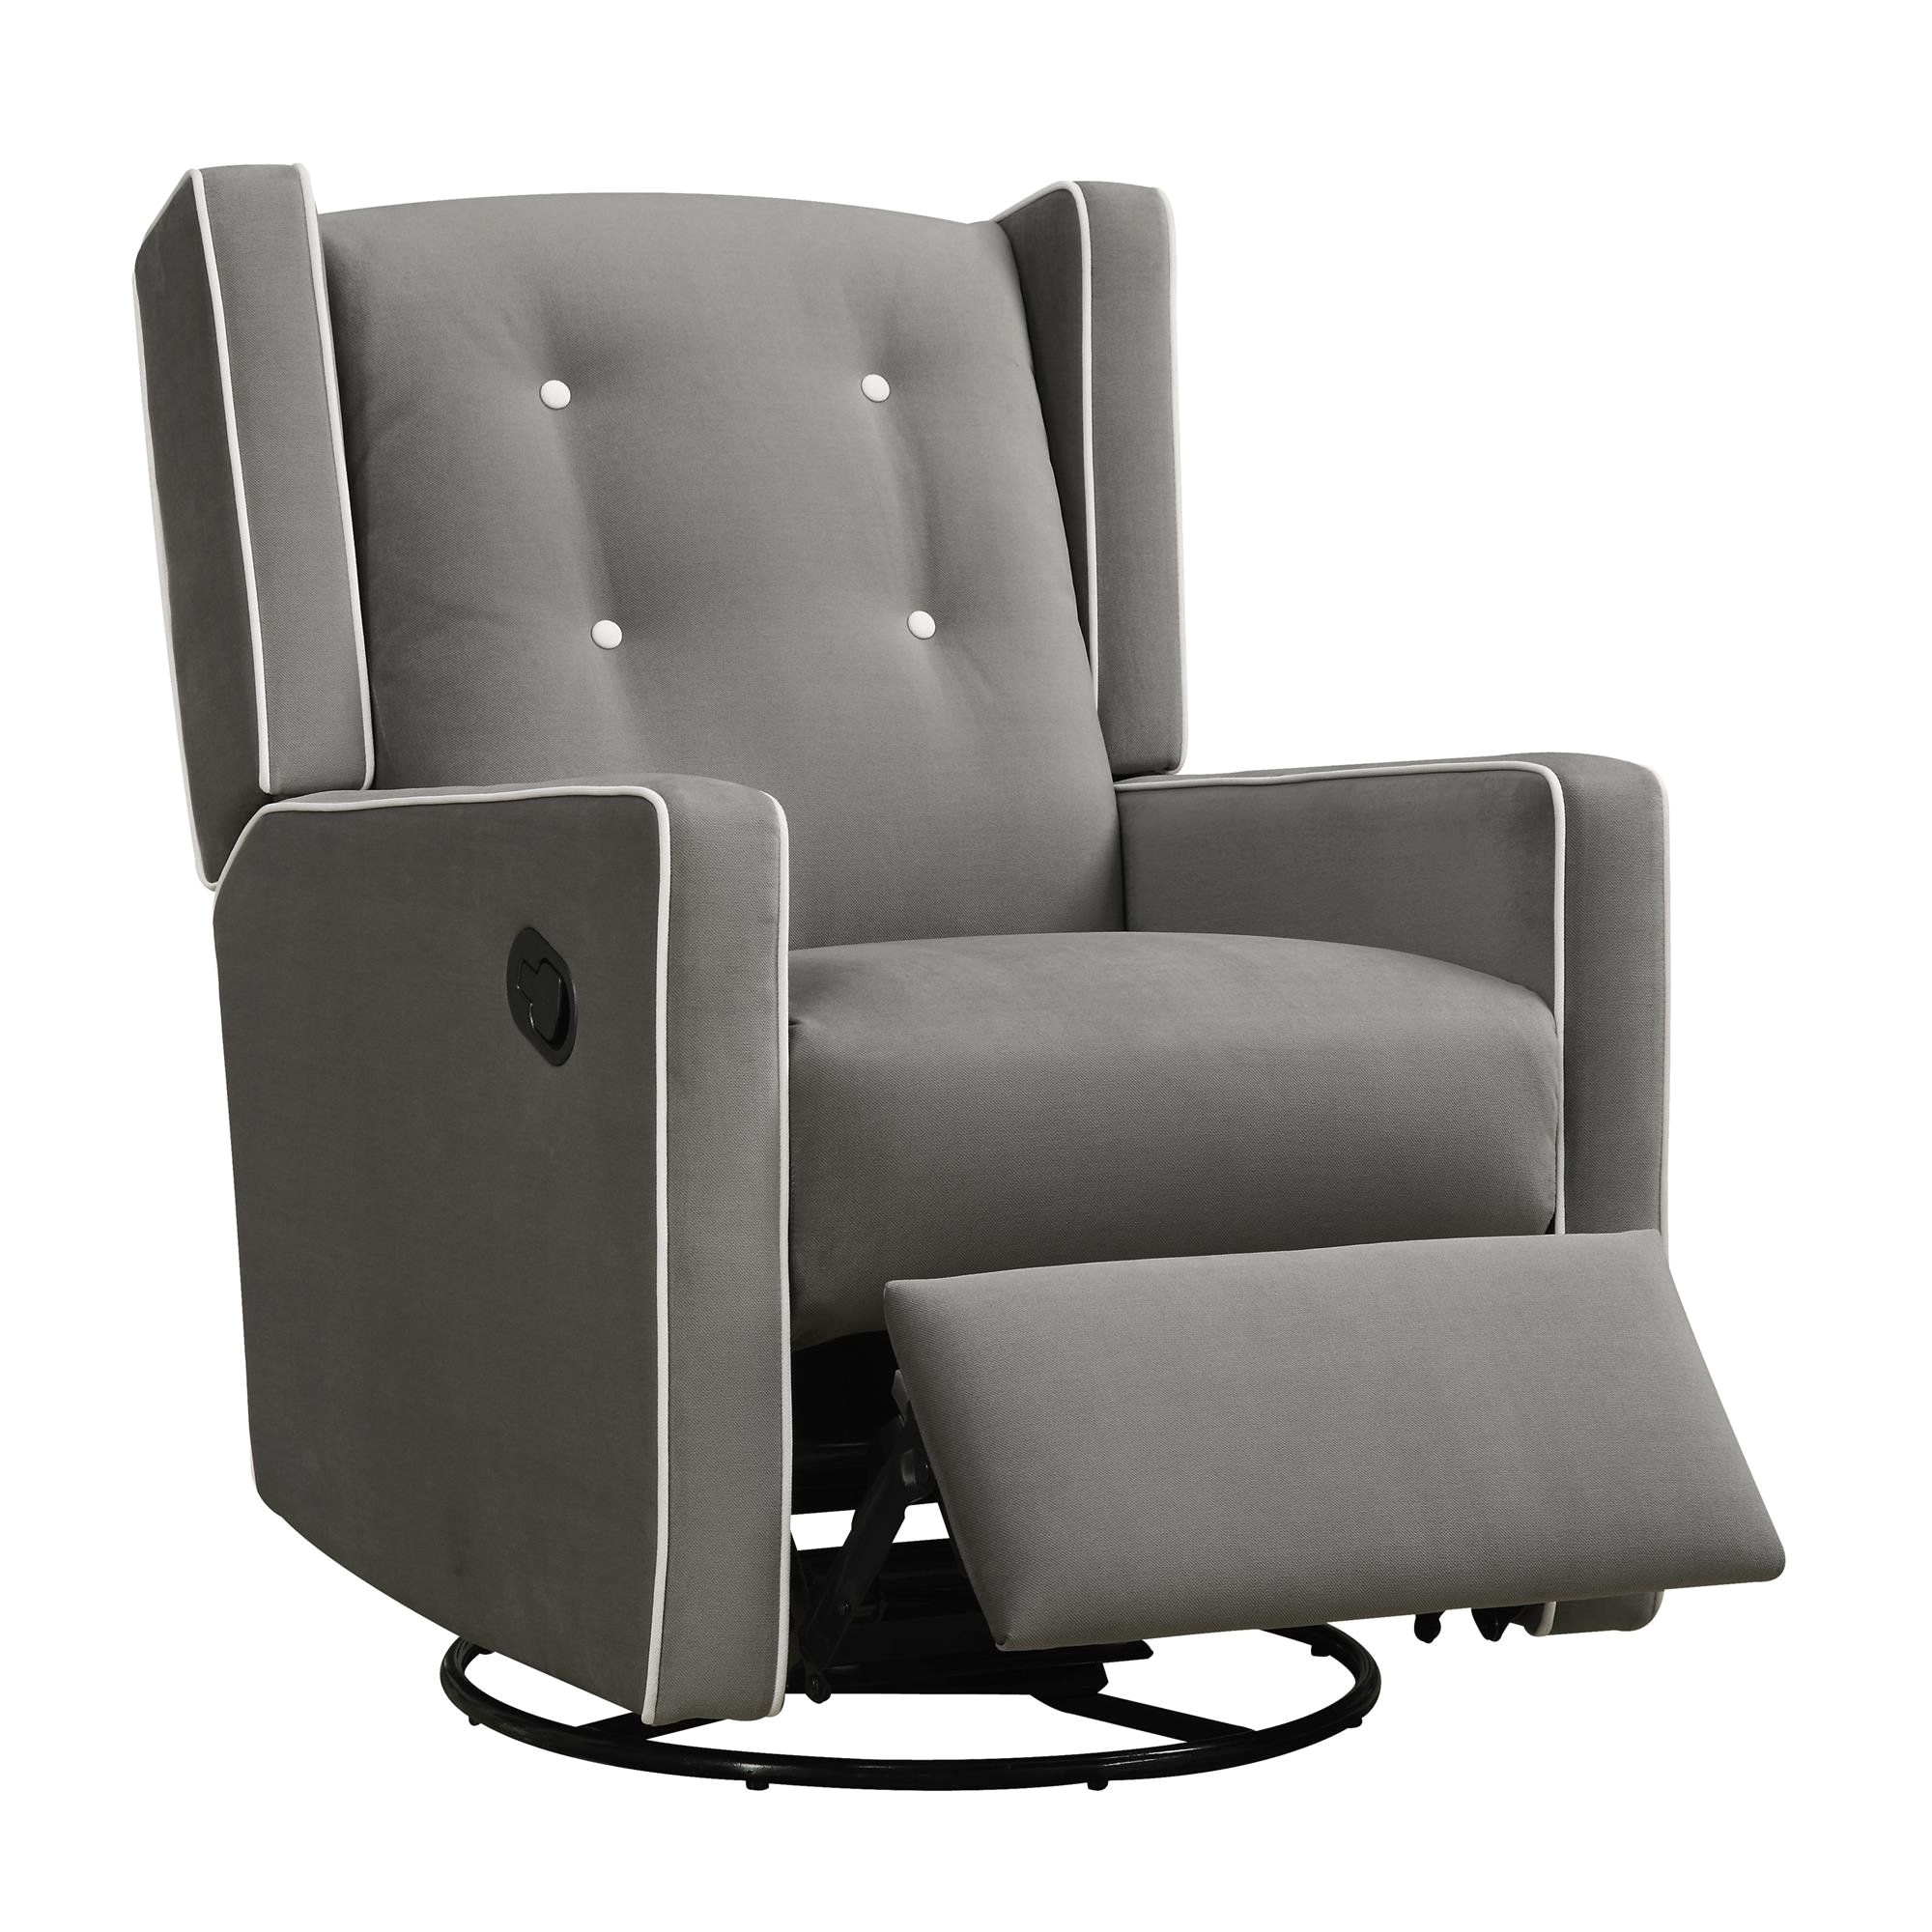 Babies R Us Nursing Chair Amazon Com Dorel Living Baby Relax Mikayla Upholstered Swivel